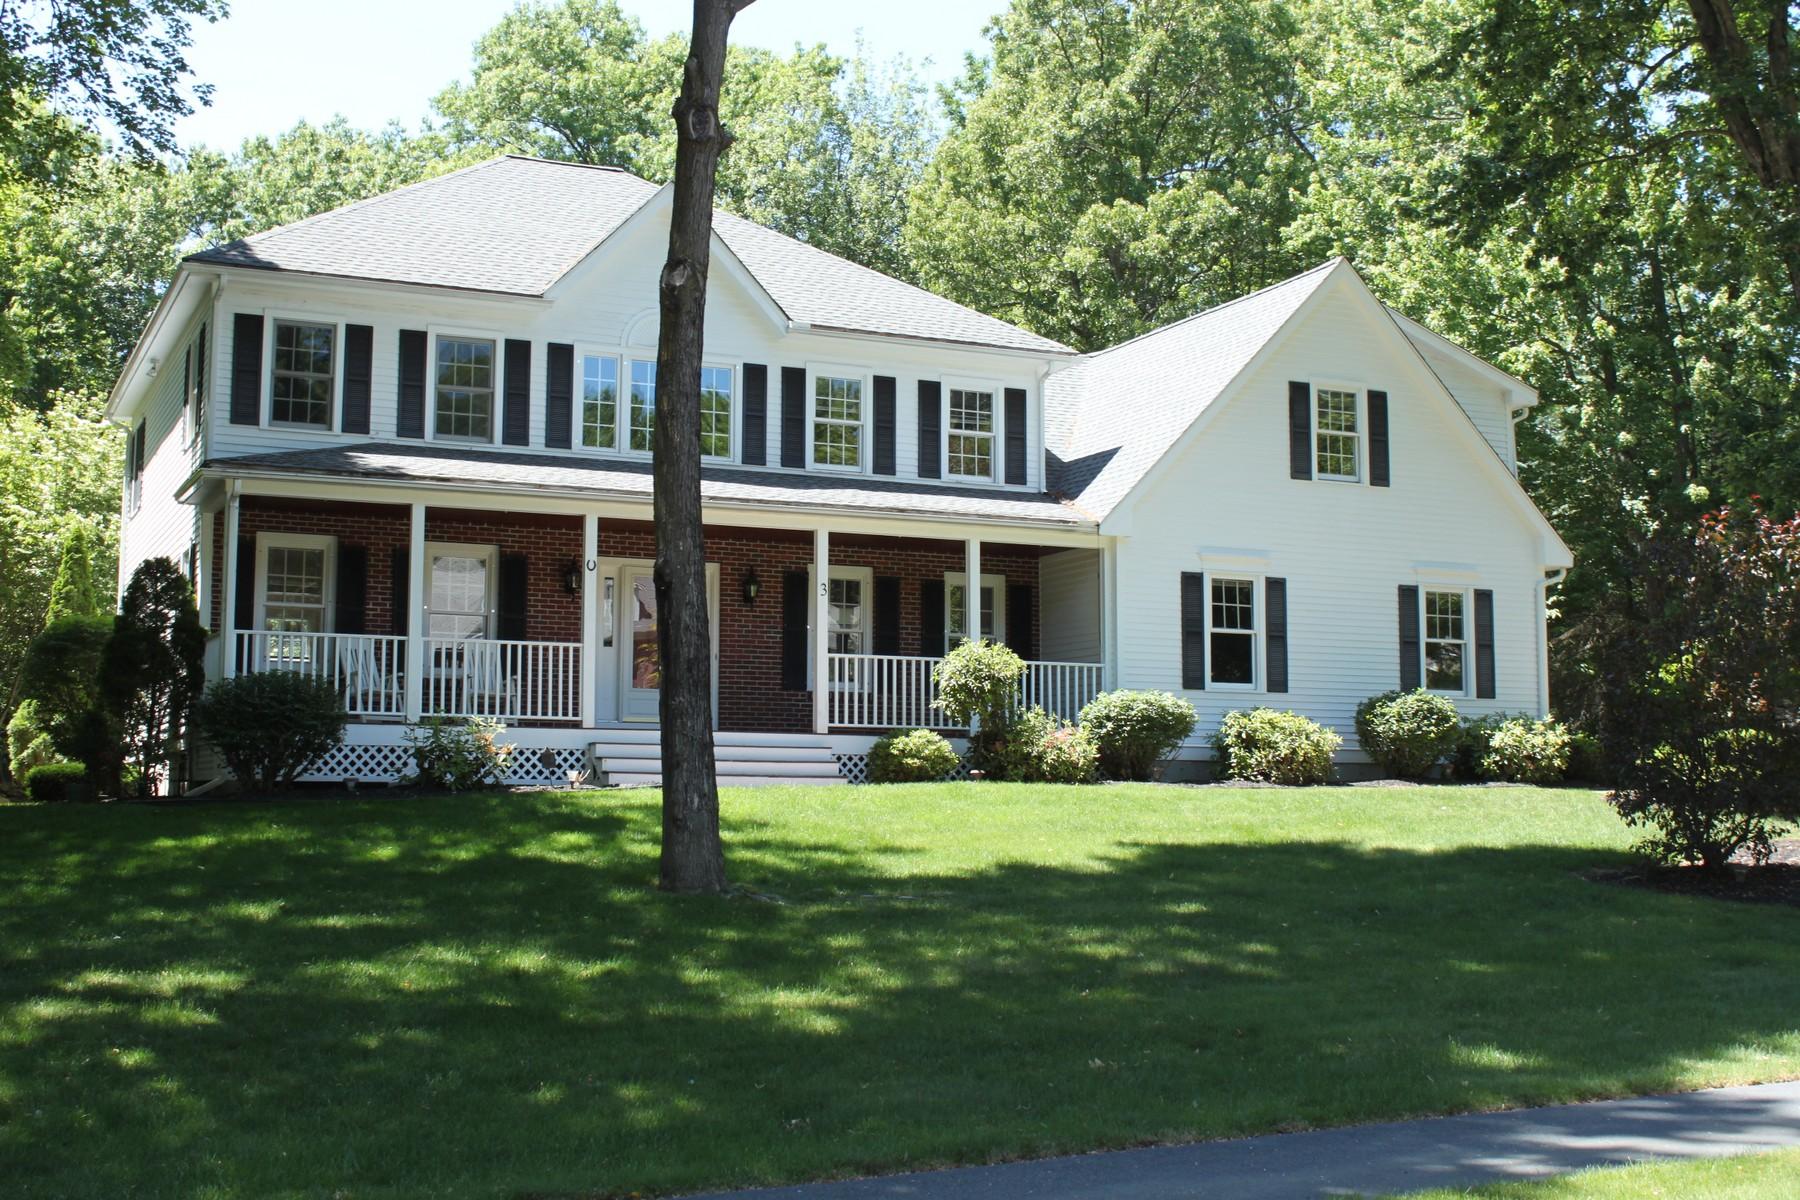 Single Family Homes for Active at Stately Coachman Ridge Colonial 3 Cobblestone Way Shrewsbury, Massachusetts 01545 United States